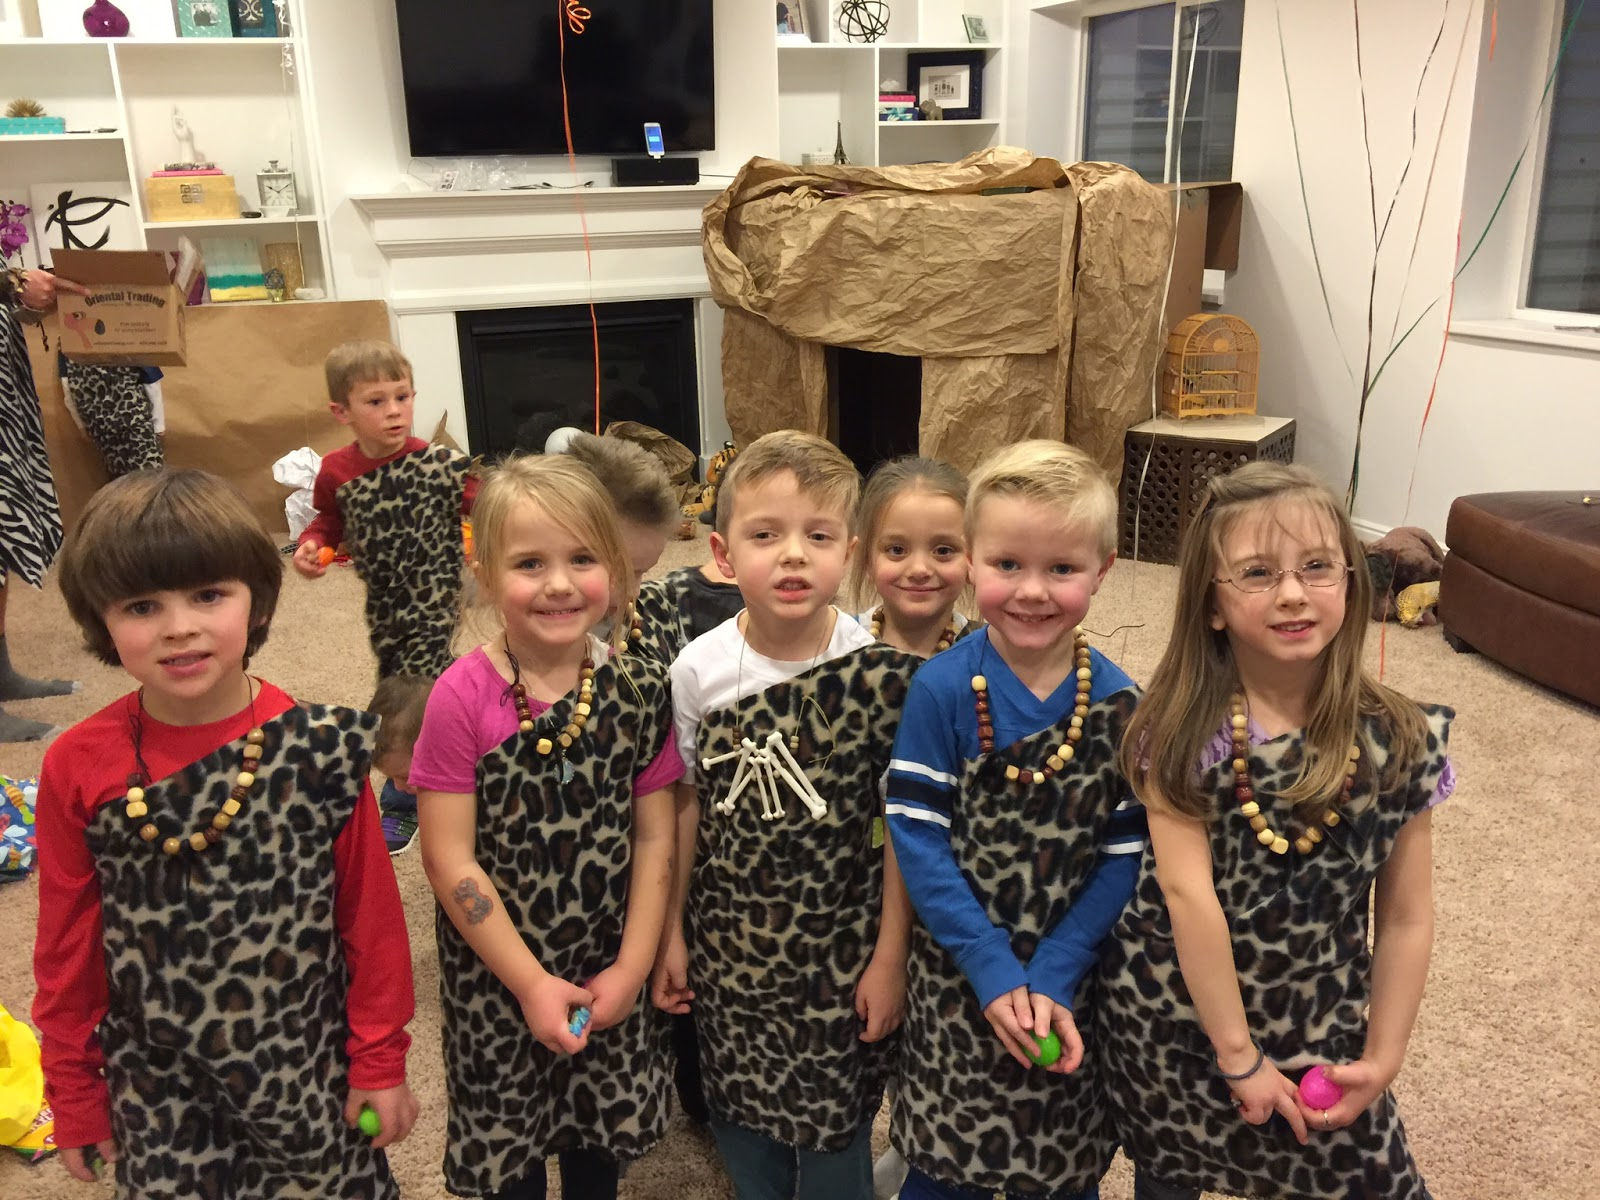 Caveman Dress Up Ideas : Restlessrisa: diy caveman costume